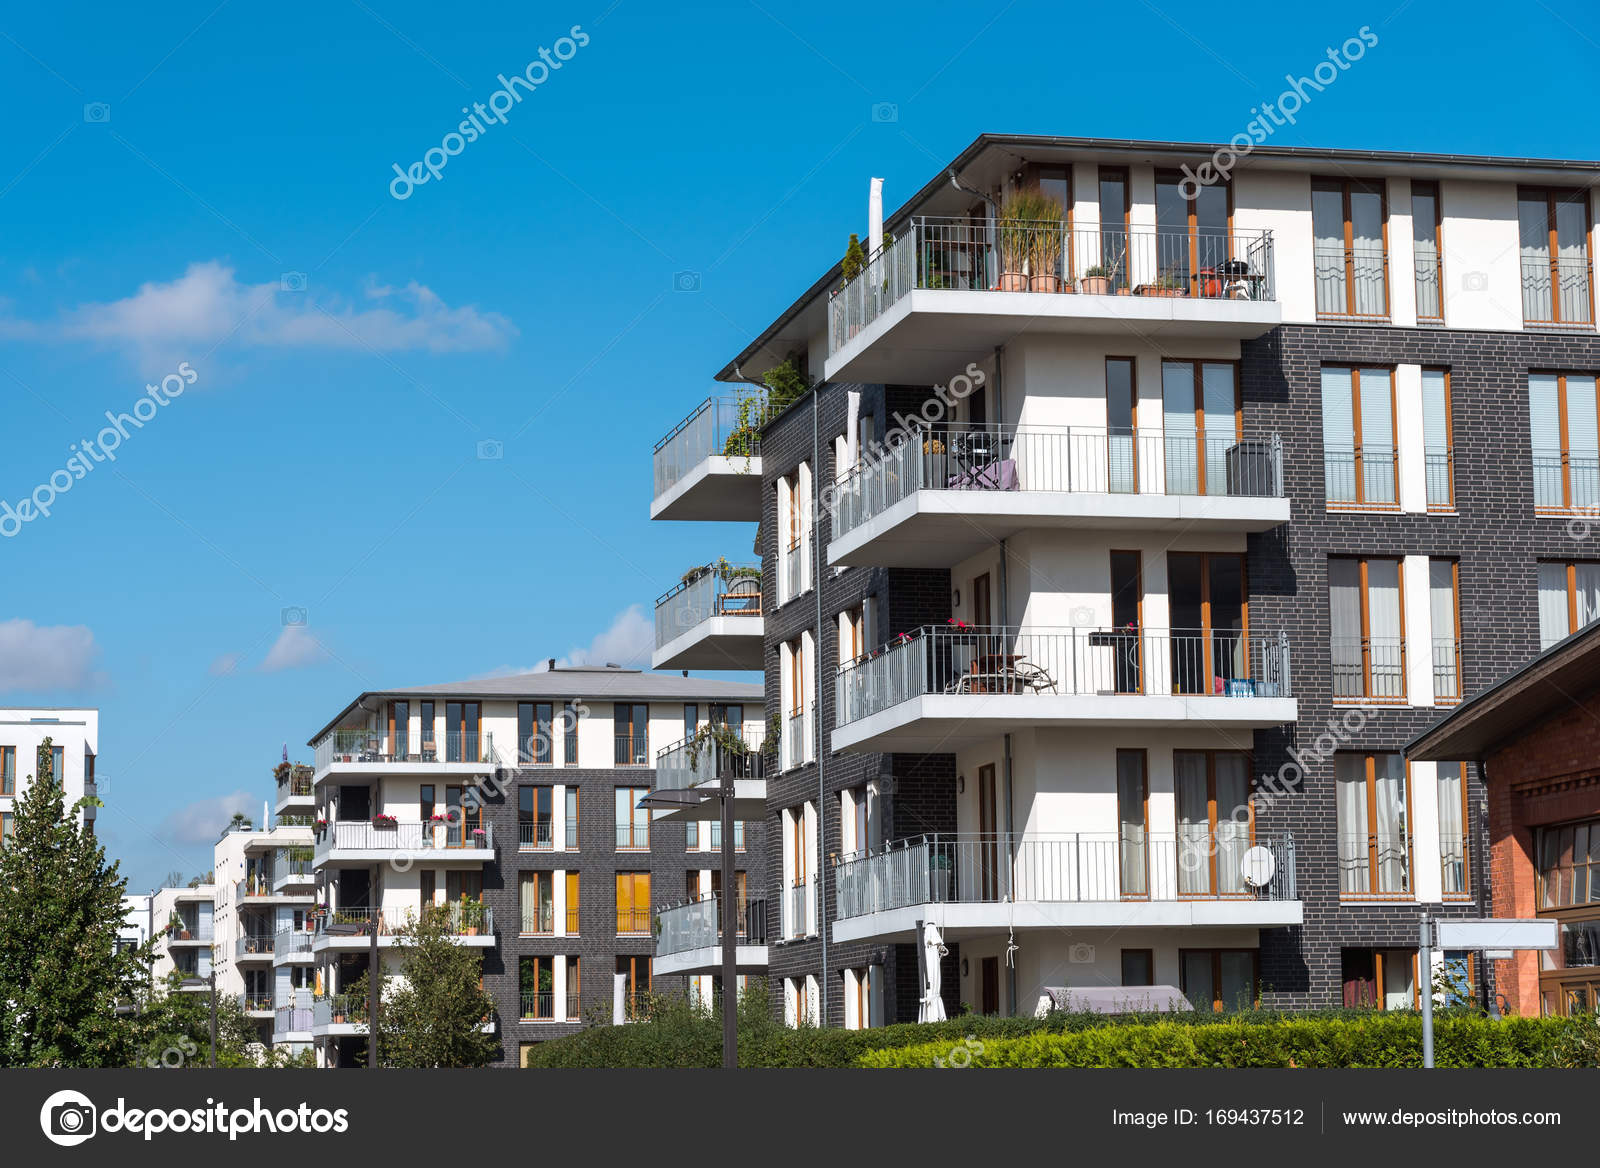 Foto Case Grigie : Nuove case grigie di appartamento a berlino u foto stock